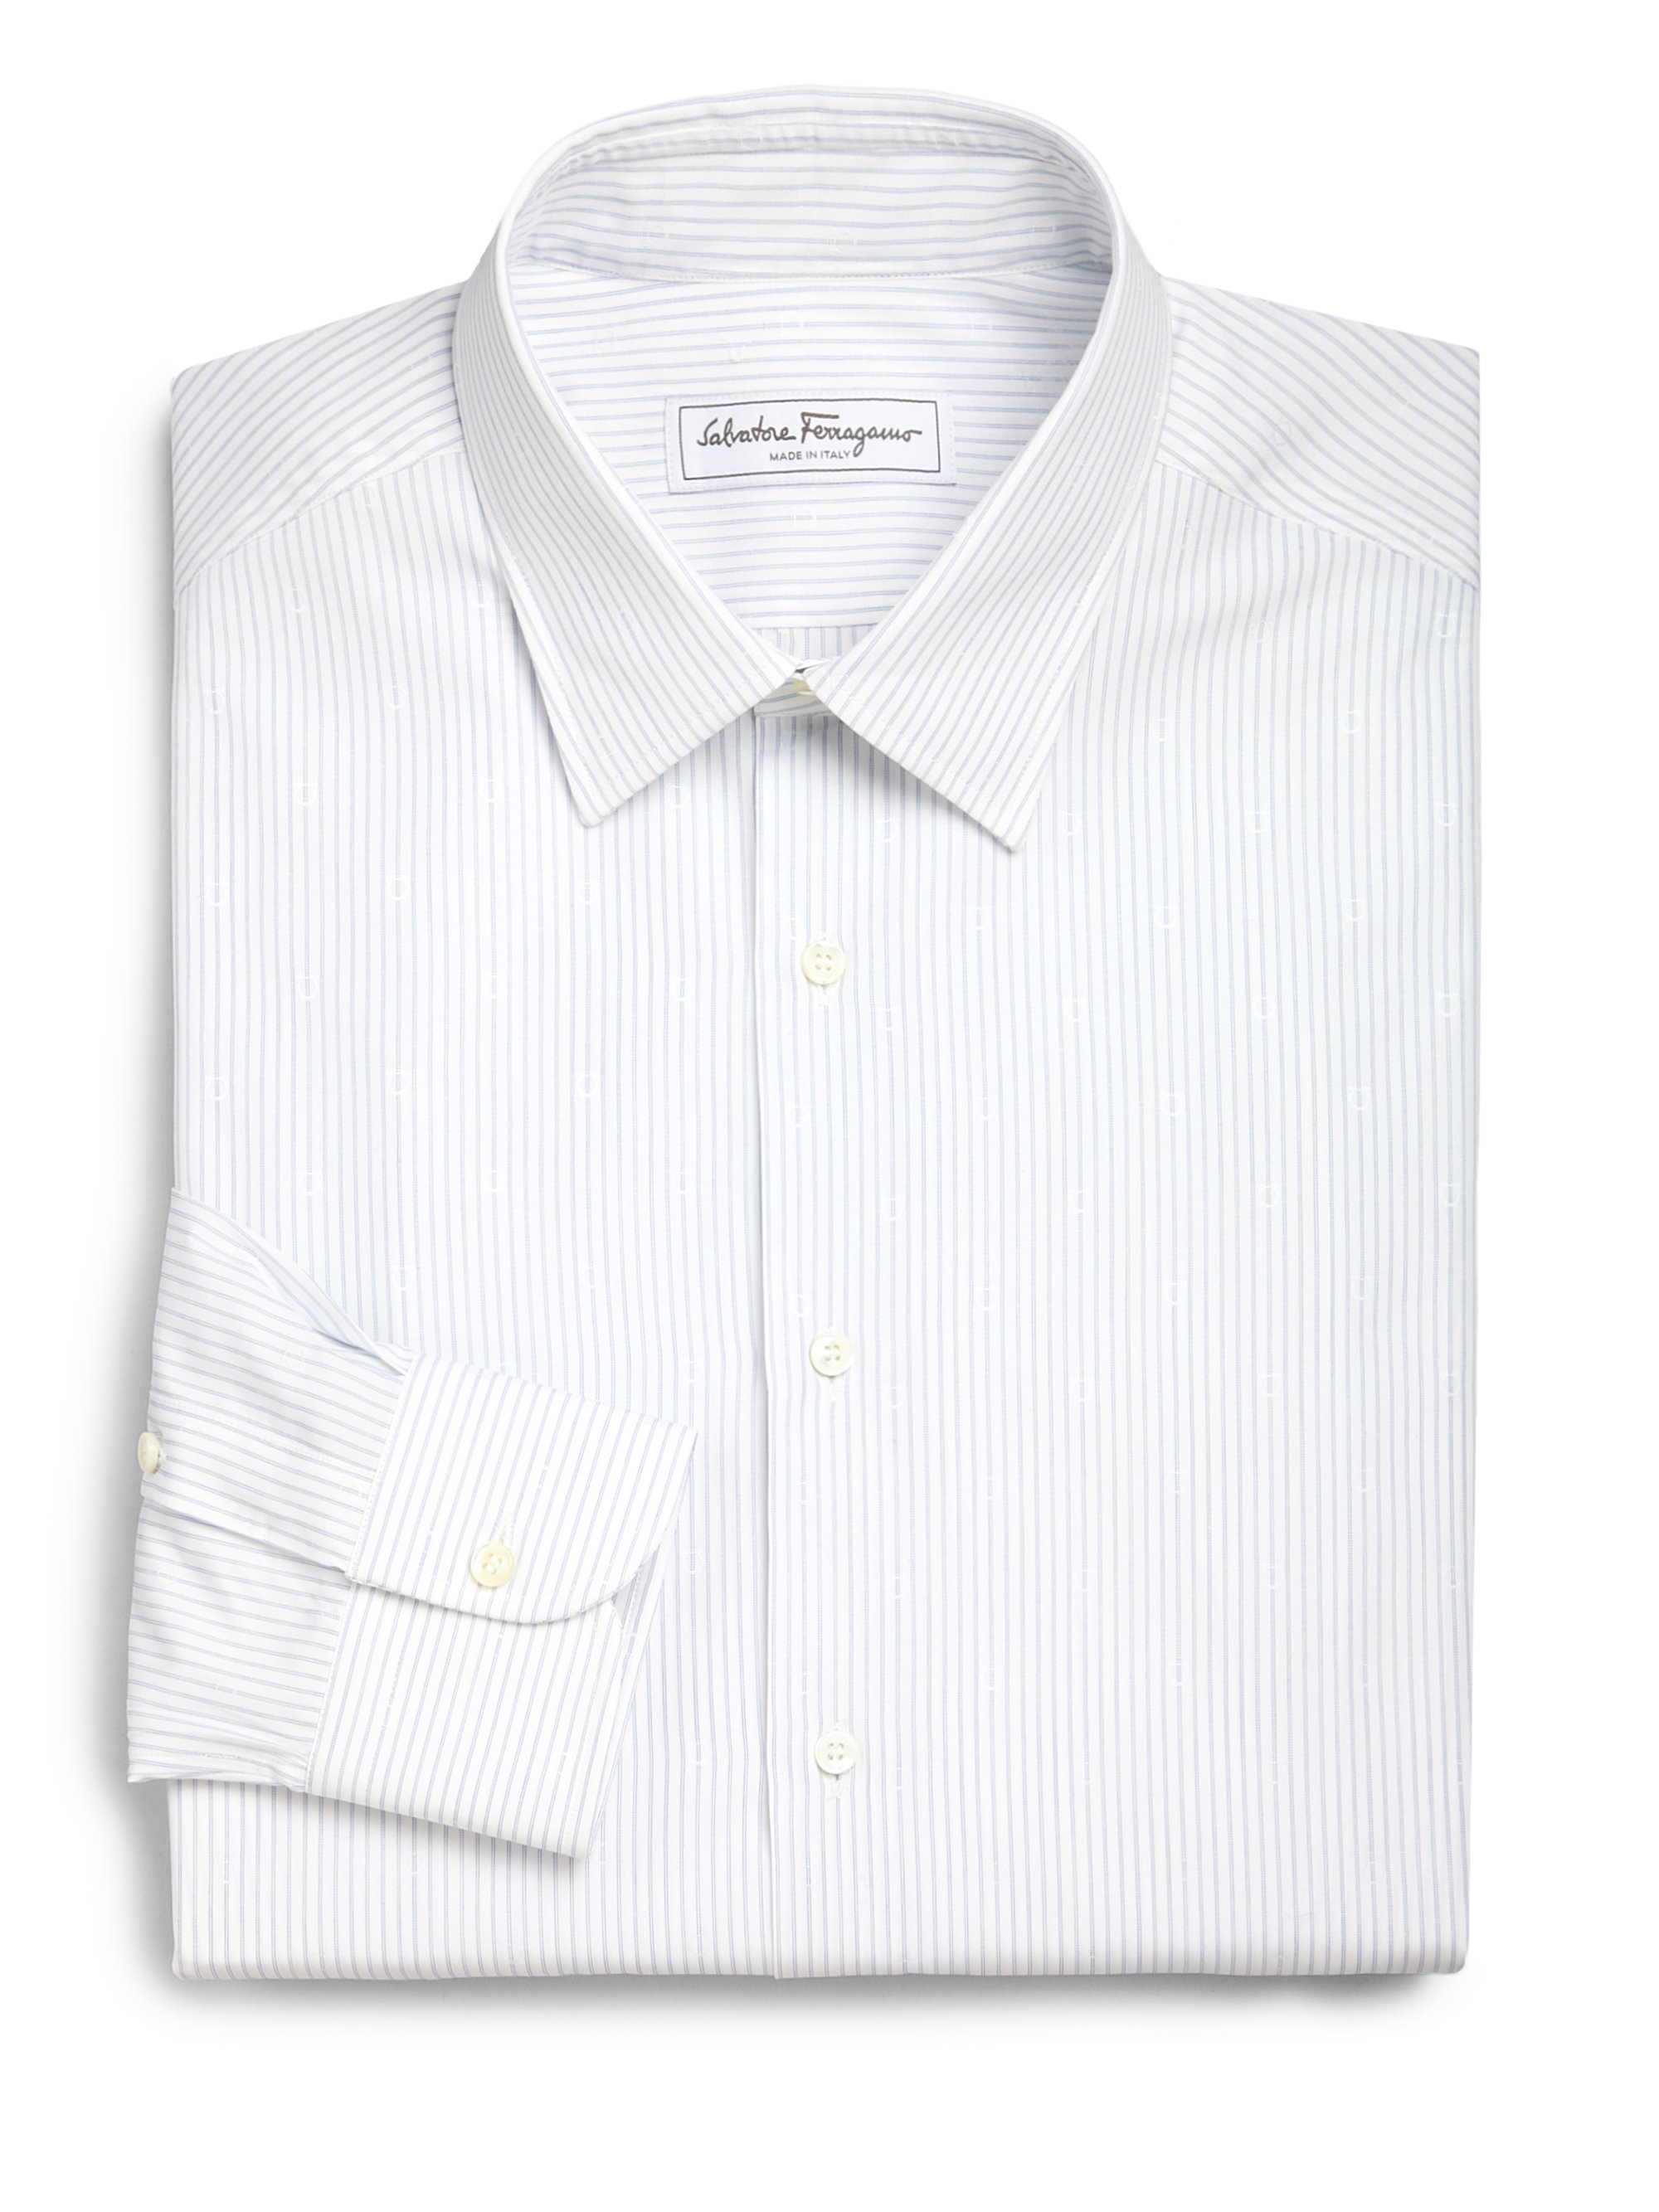 Lyst Ferragamo Striped Cotton Dress Shirt In White For Men